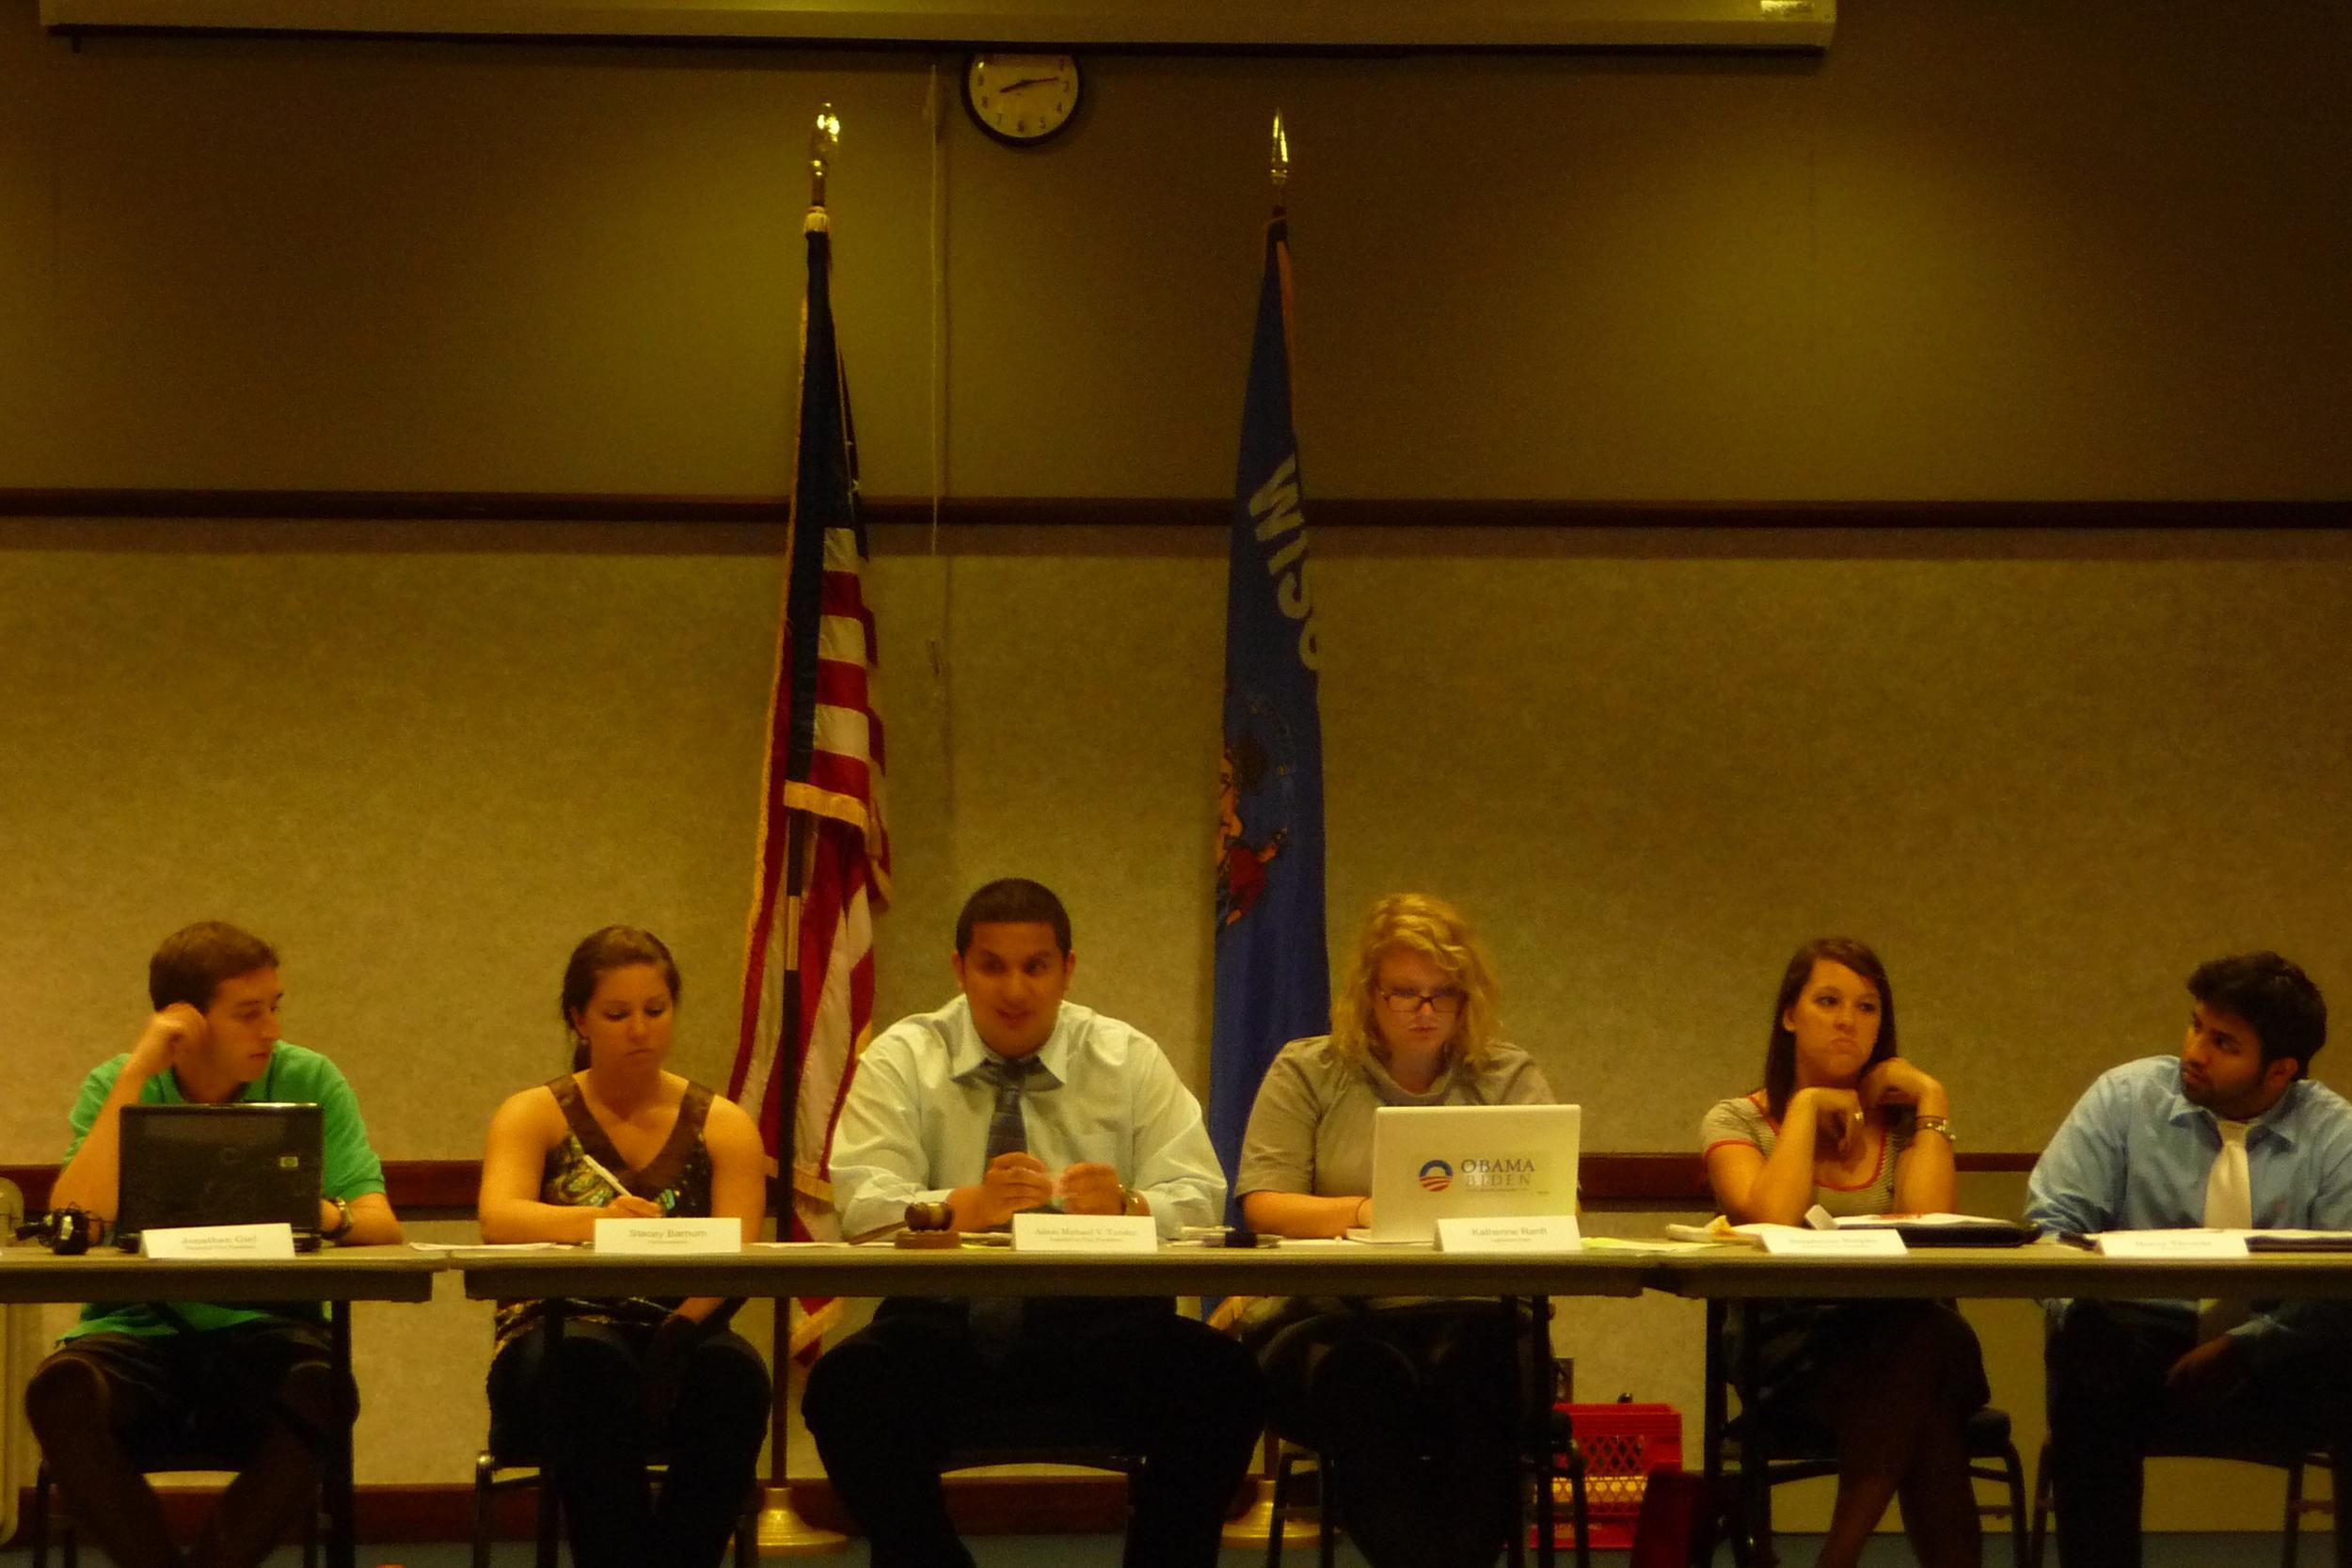 The MUSG Executive Board